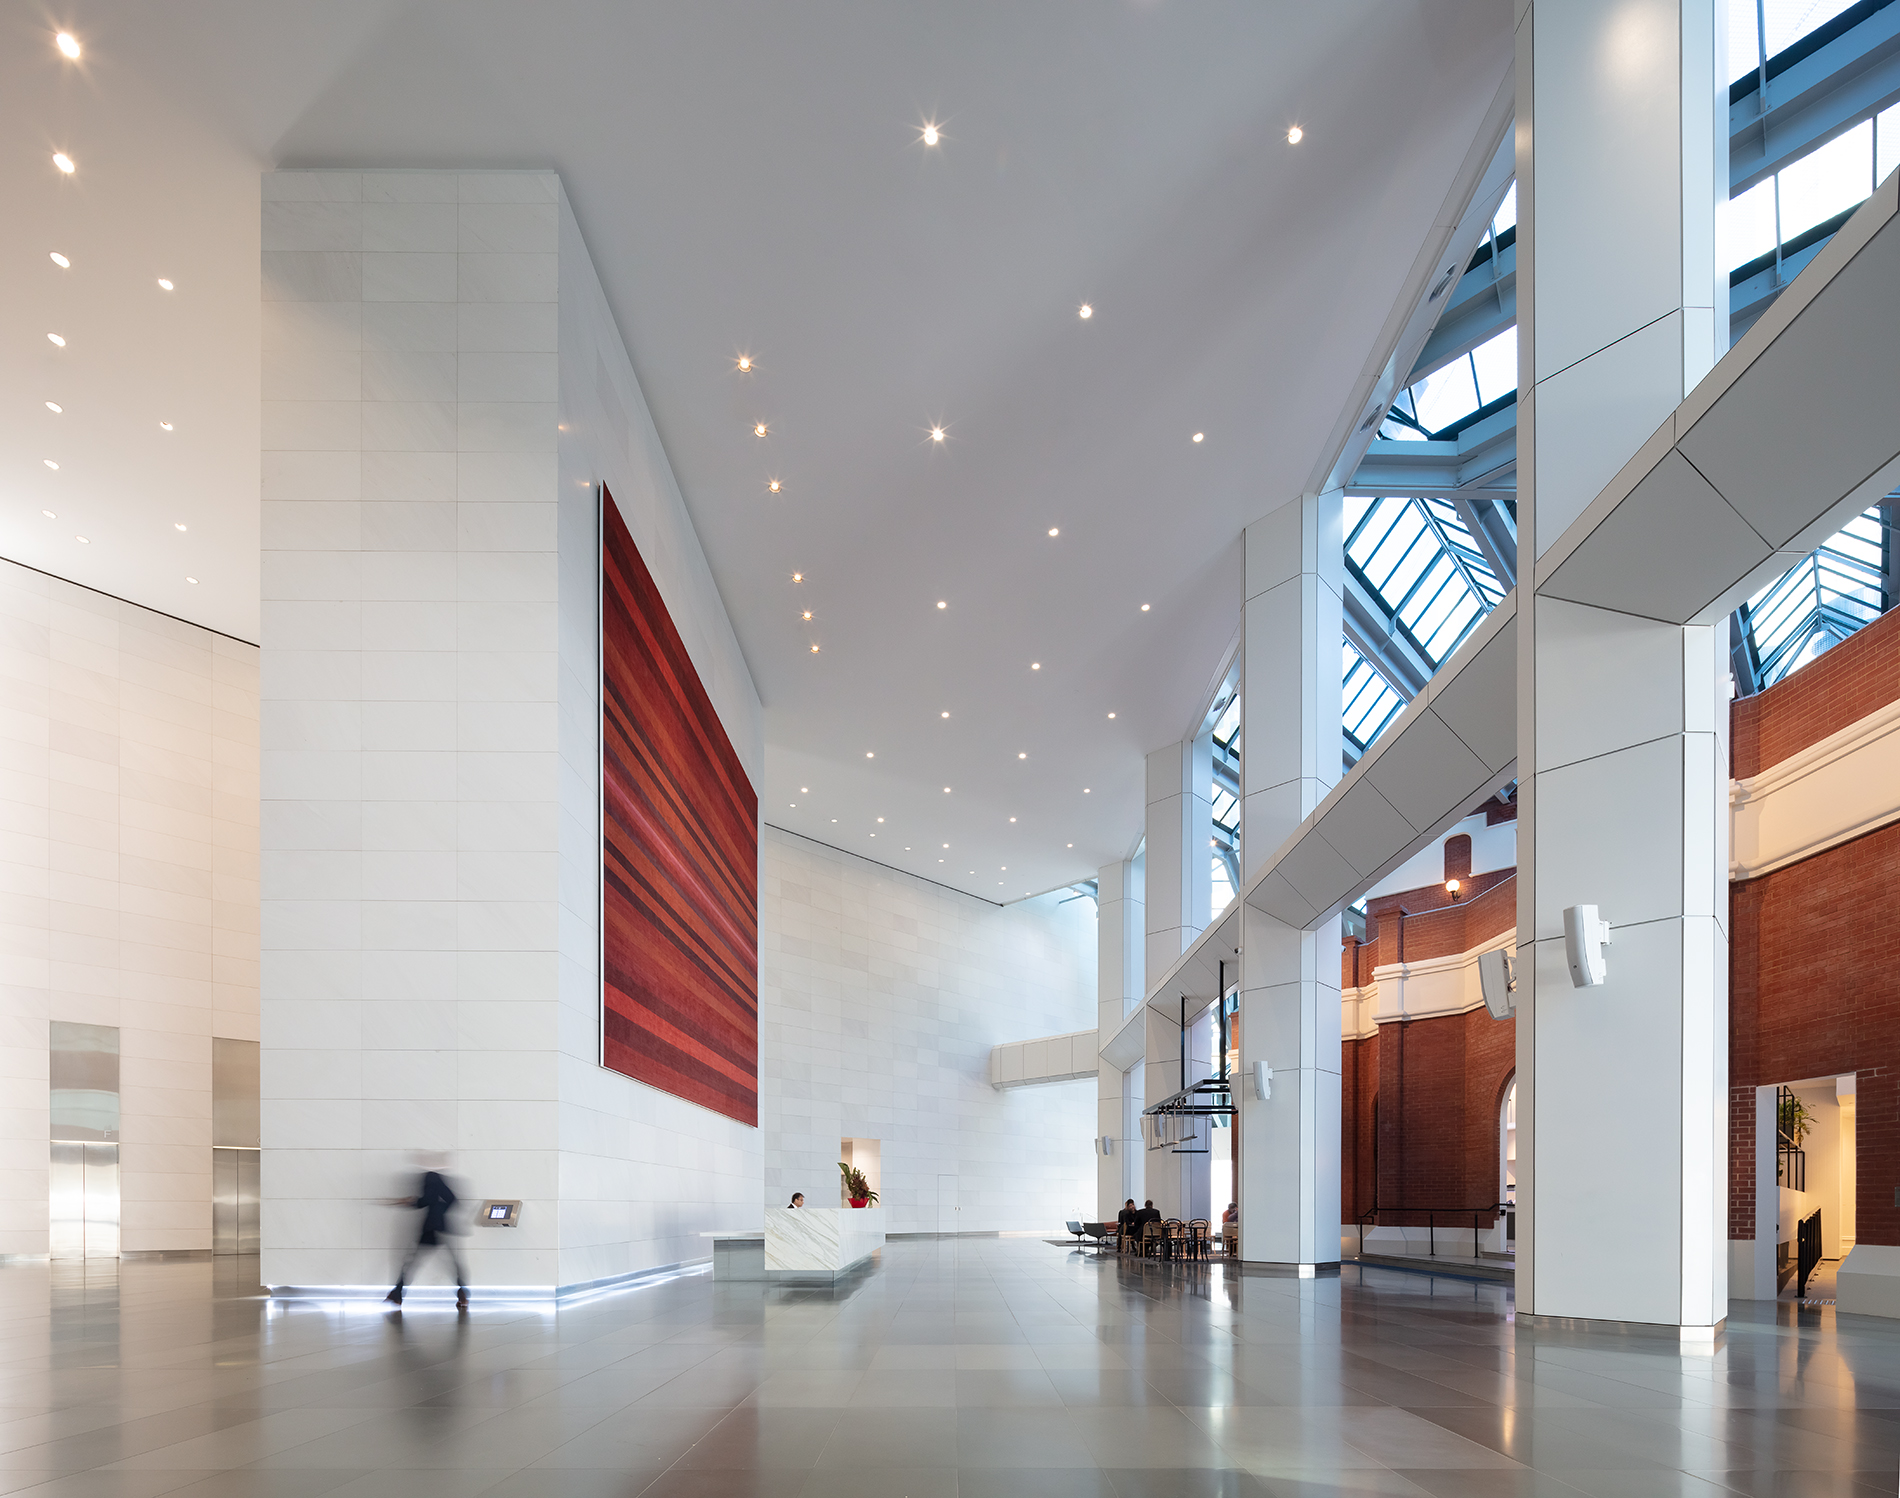 Lobby of a modern office building